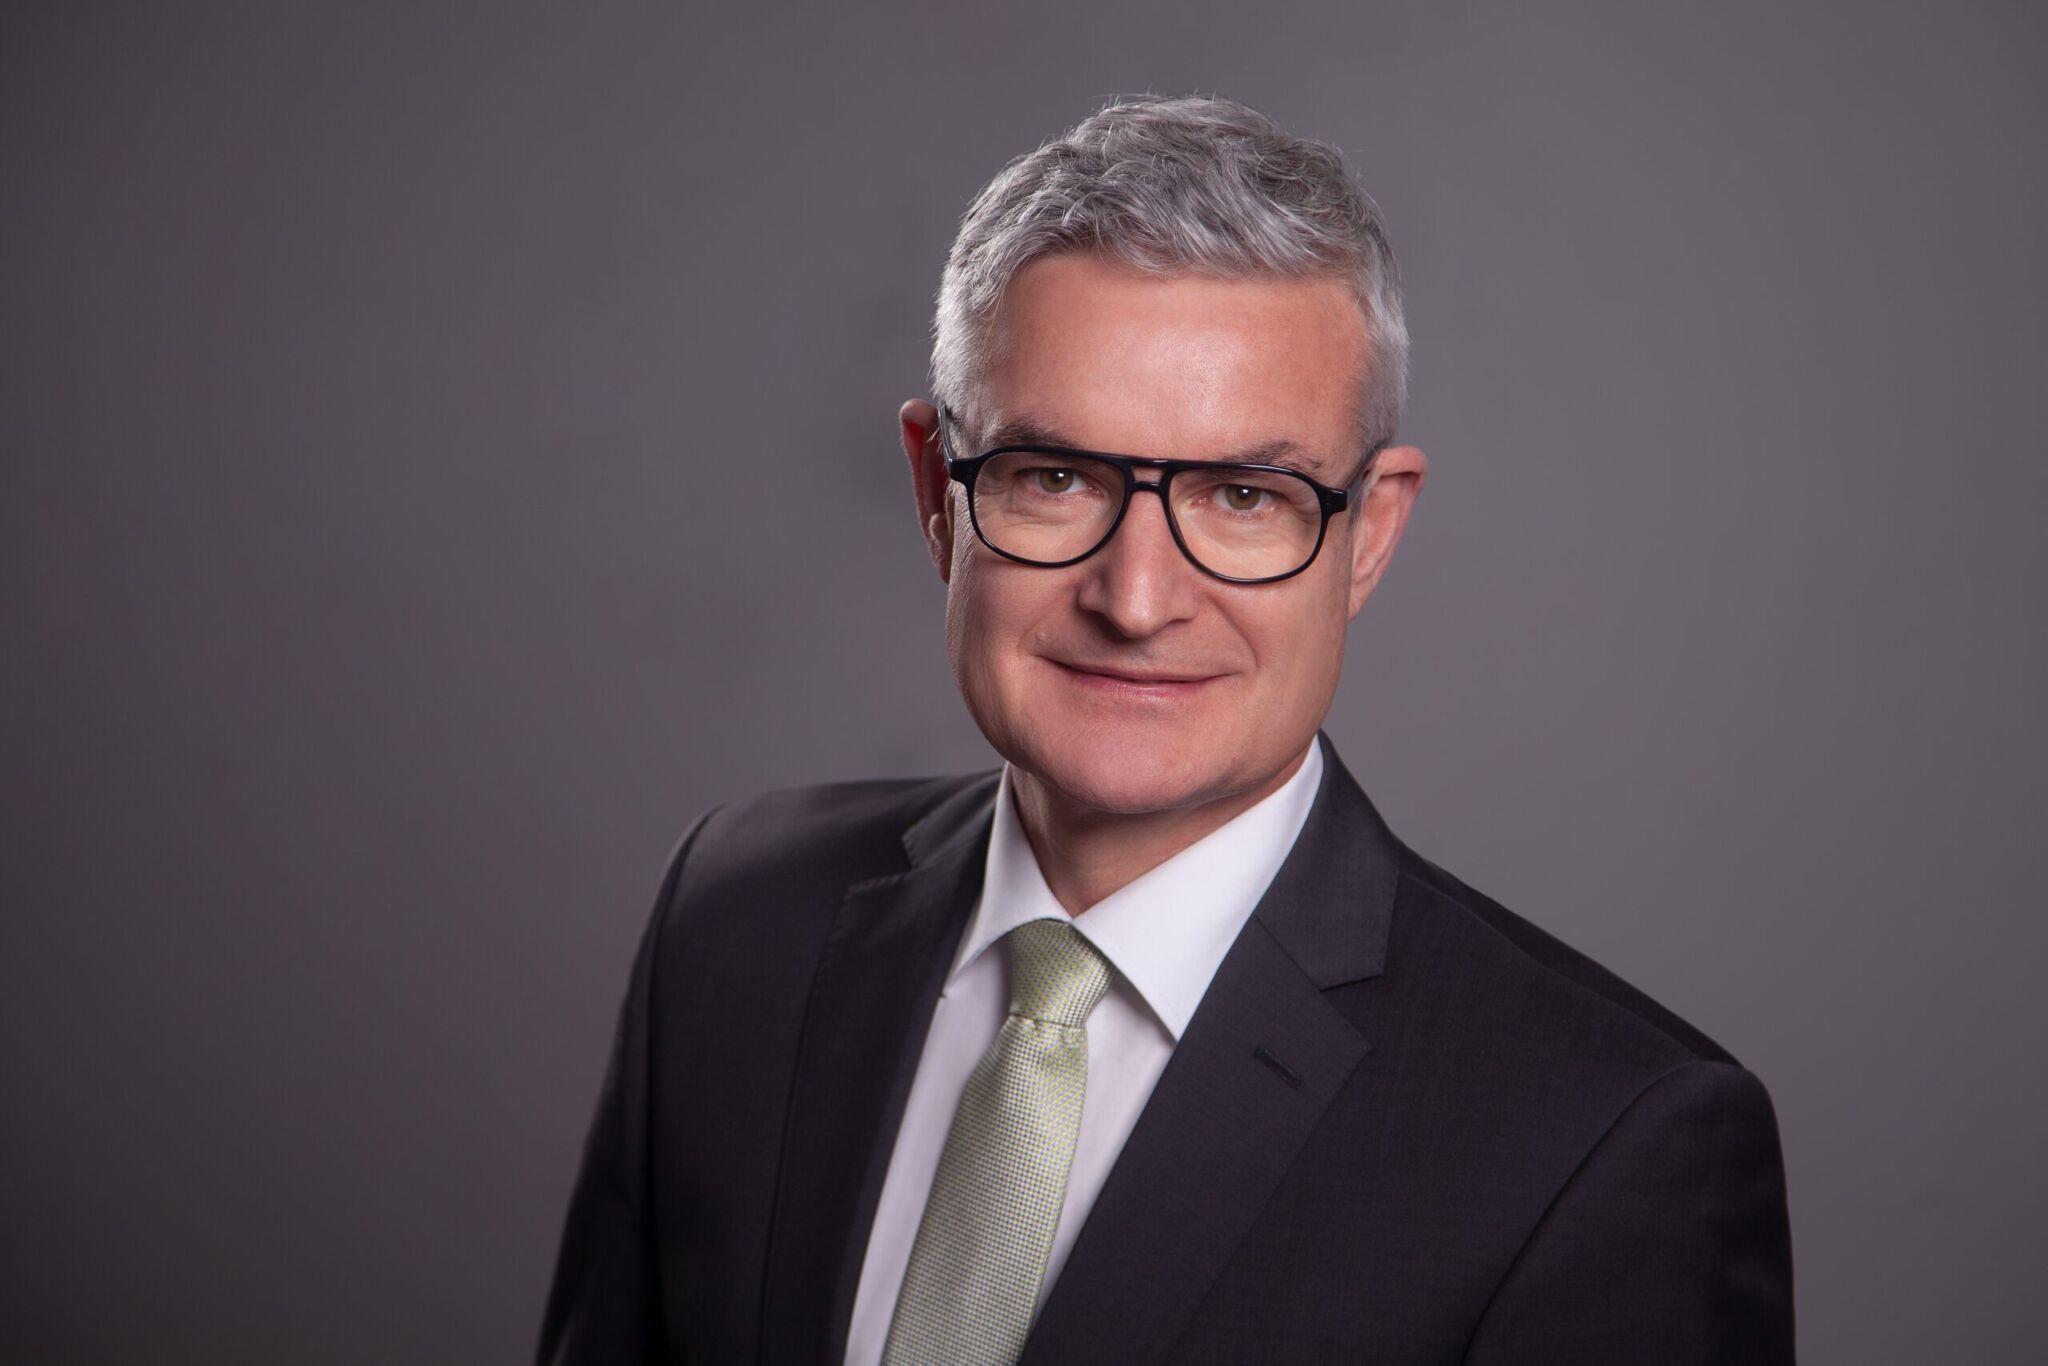 Uli Nickol wird Geschäftsführer in Bad Saulgau.|copyright: CLAAS